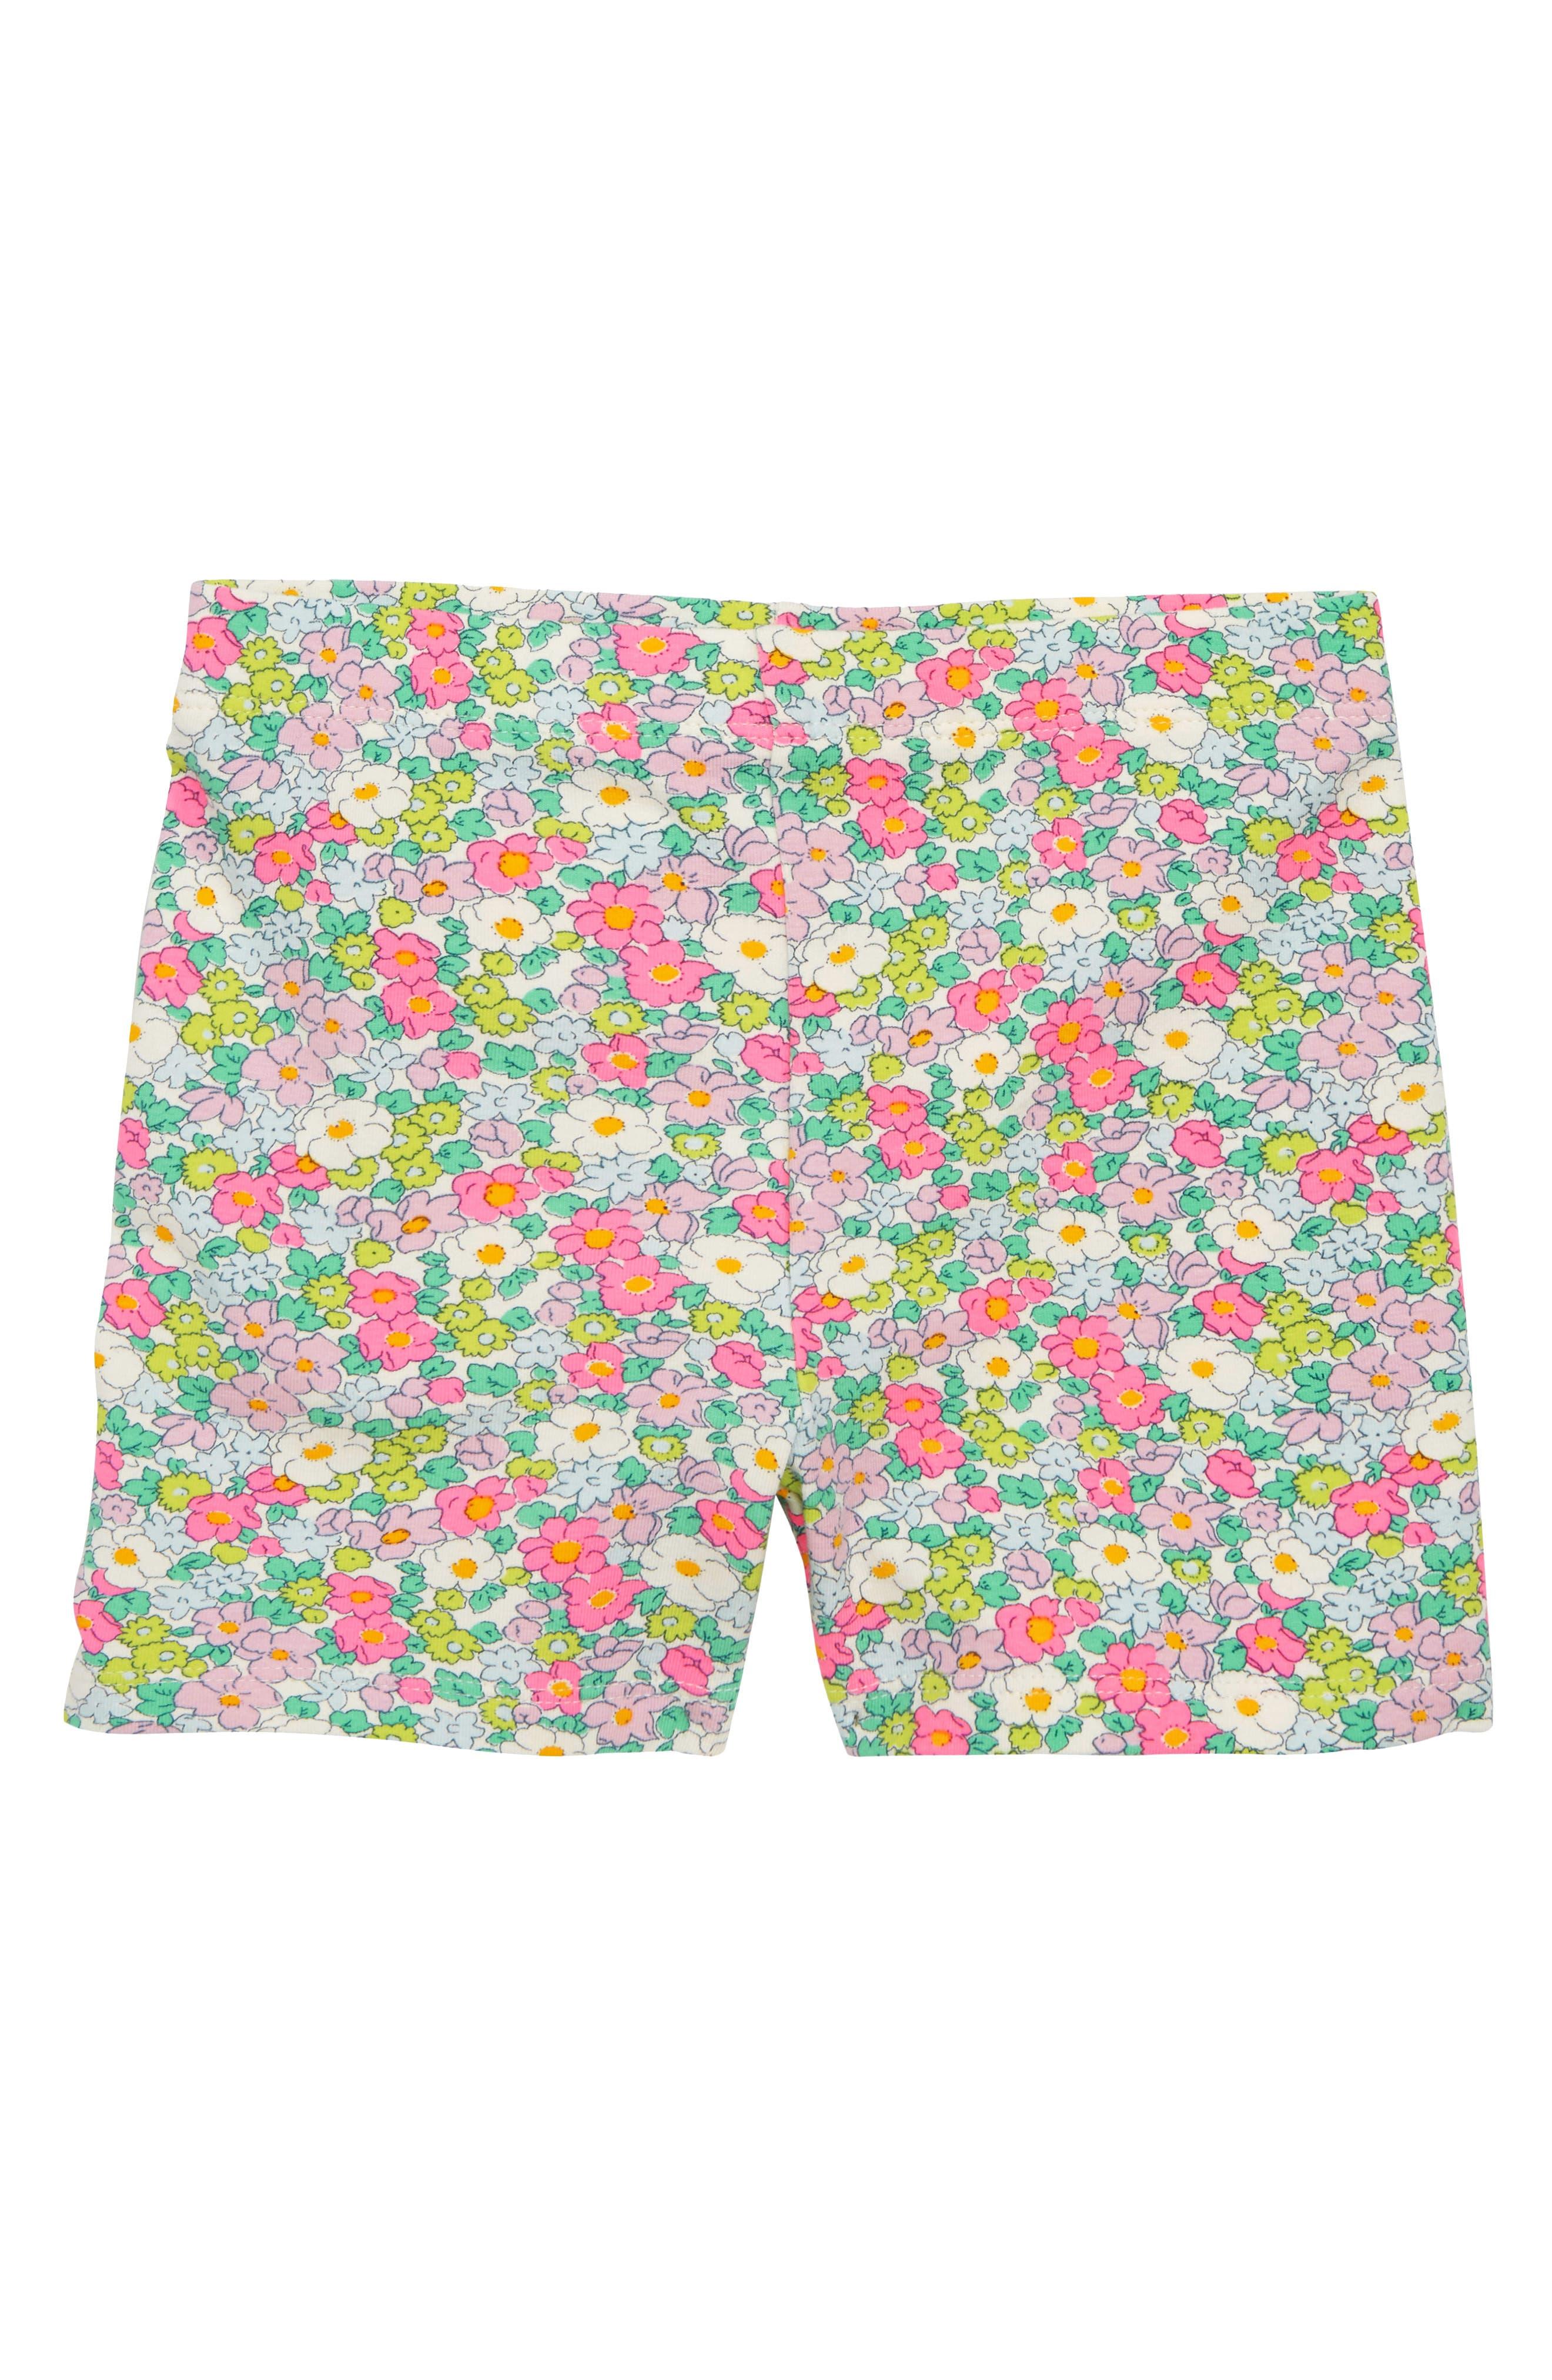 Jersey Shorts,                         Main,                         color, Knockout Pink Vintag